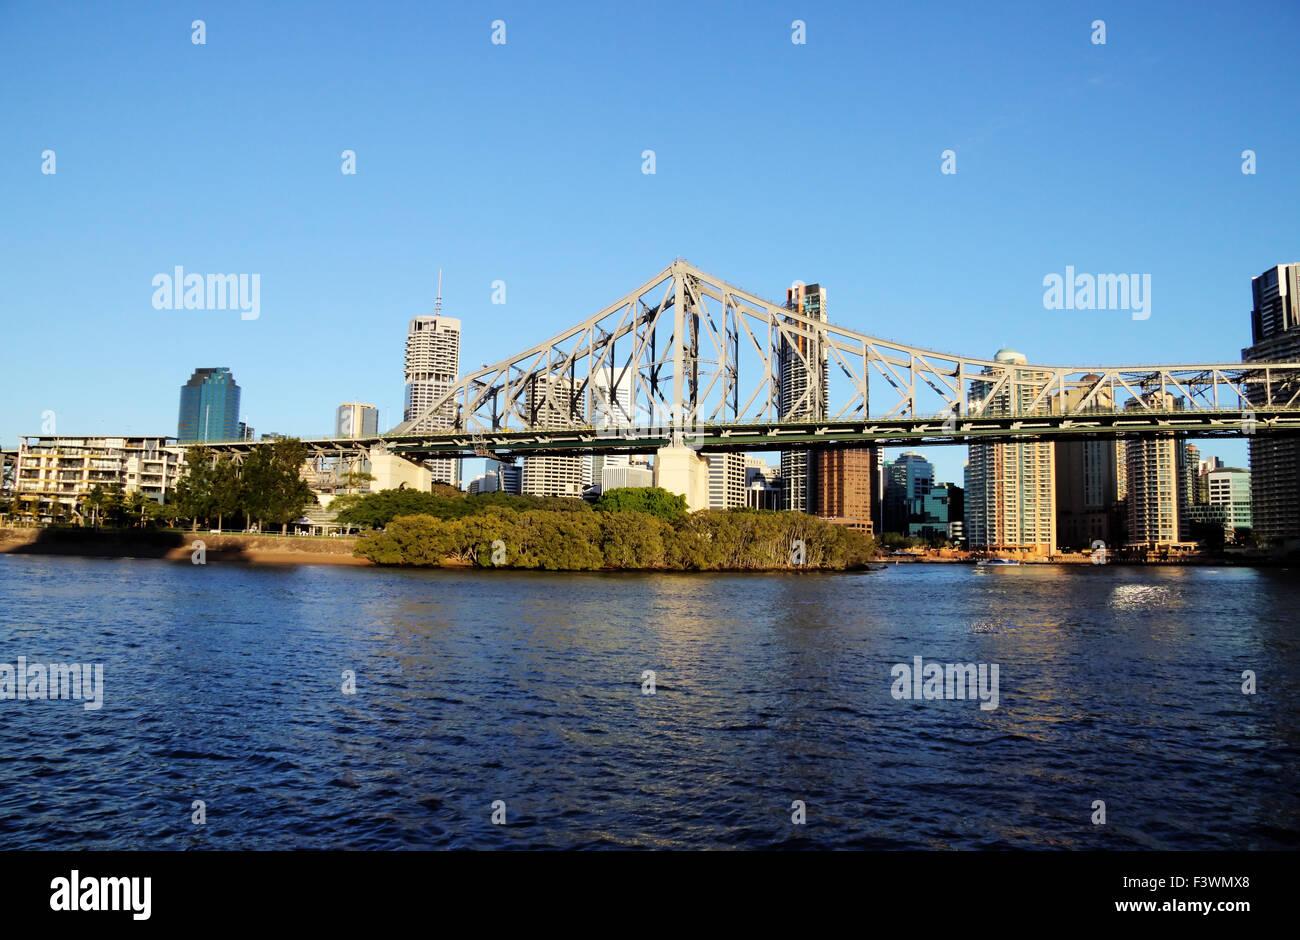 Story Bridge Brisbane Australia - Stock Image